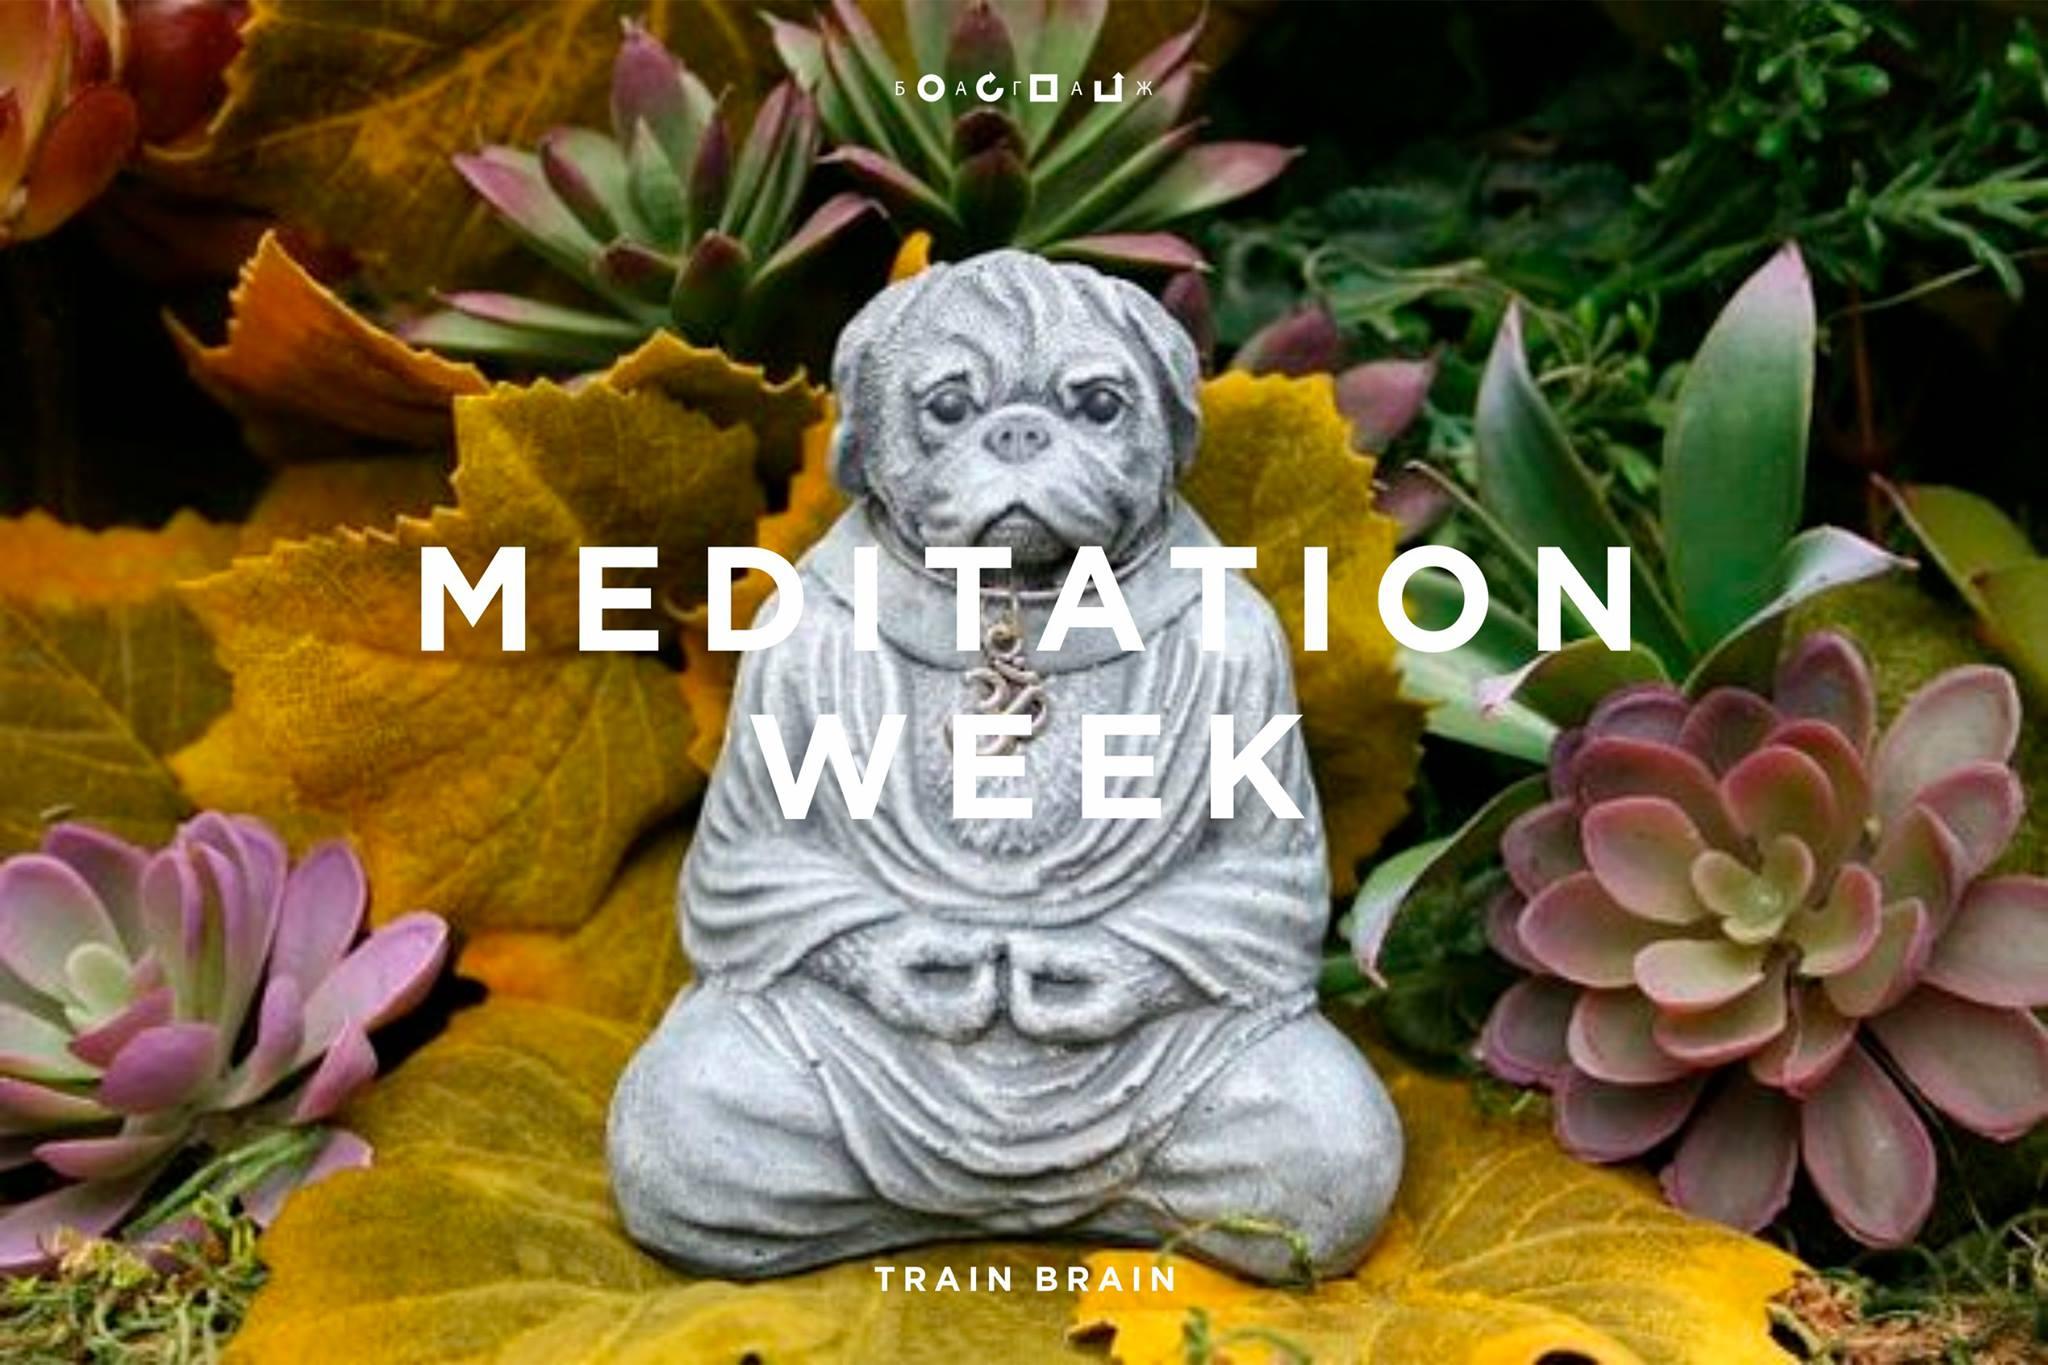 04_july_2016_MEDITATION WEEK